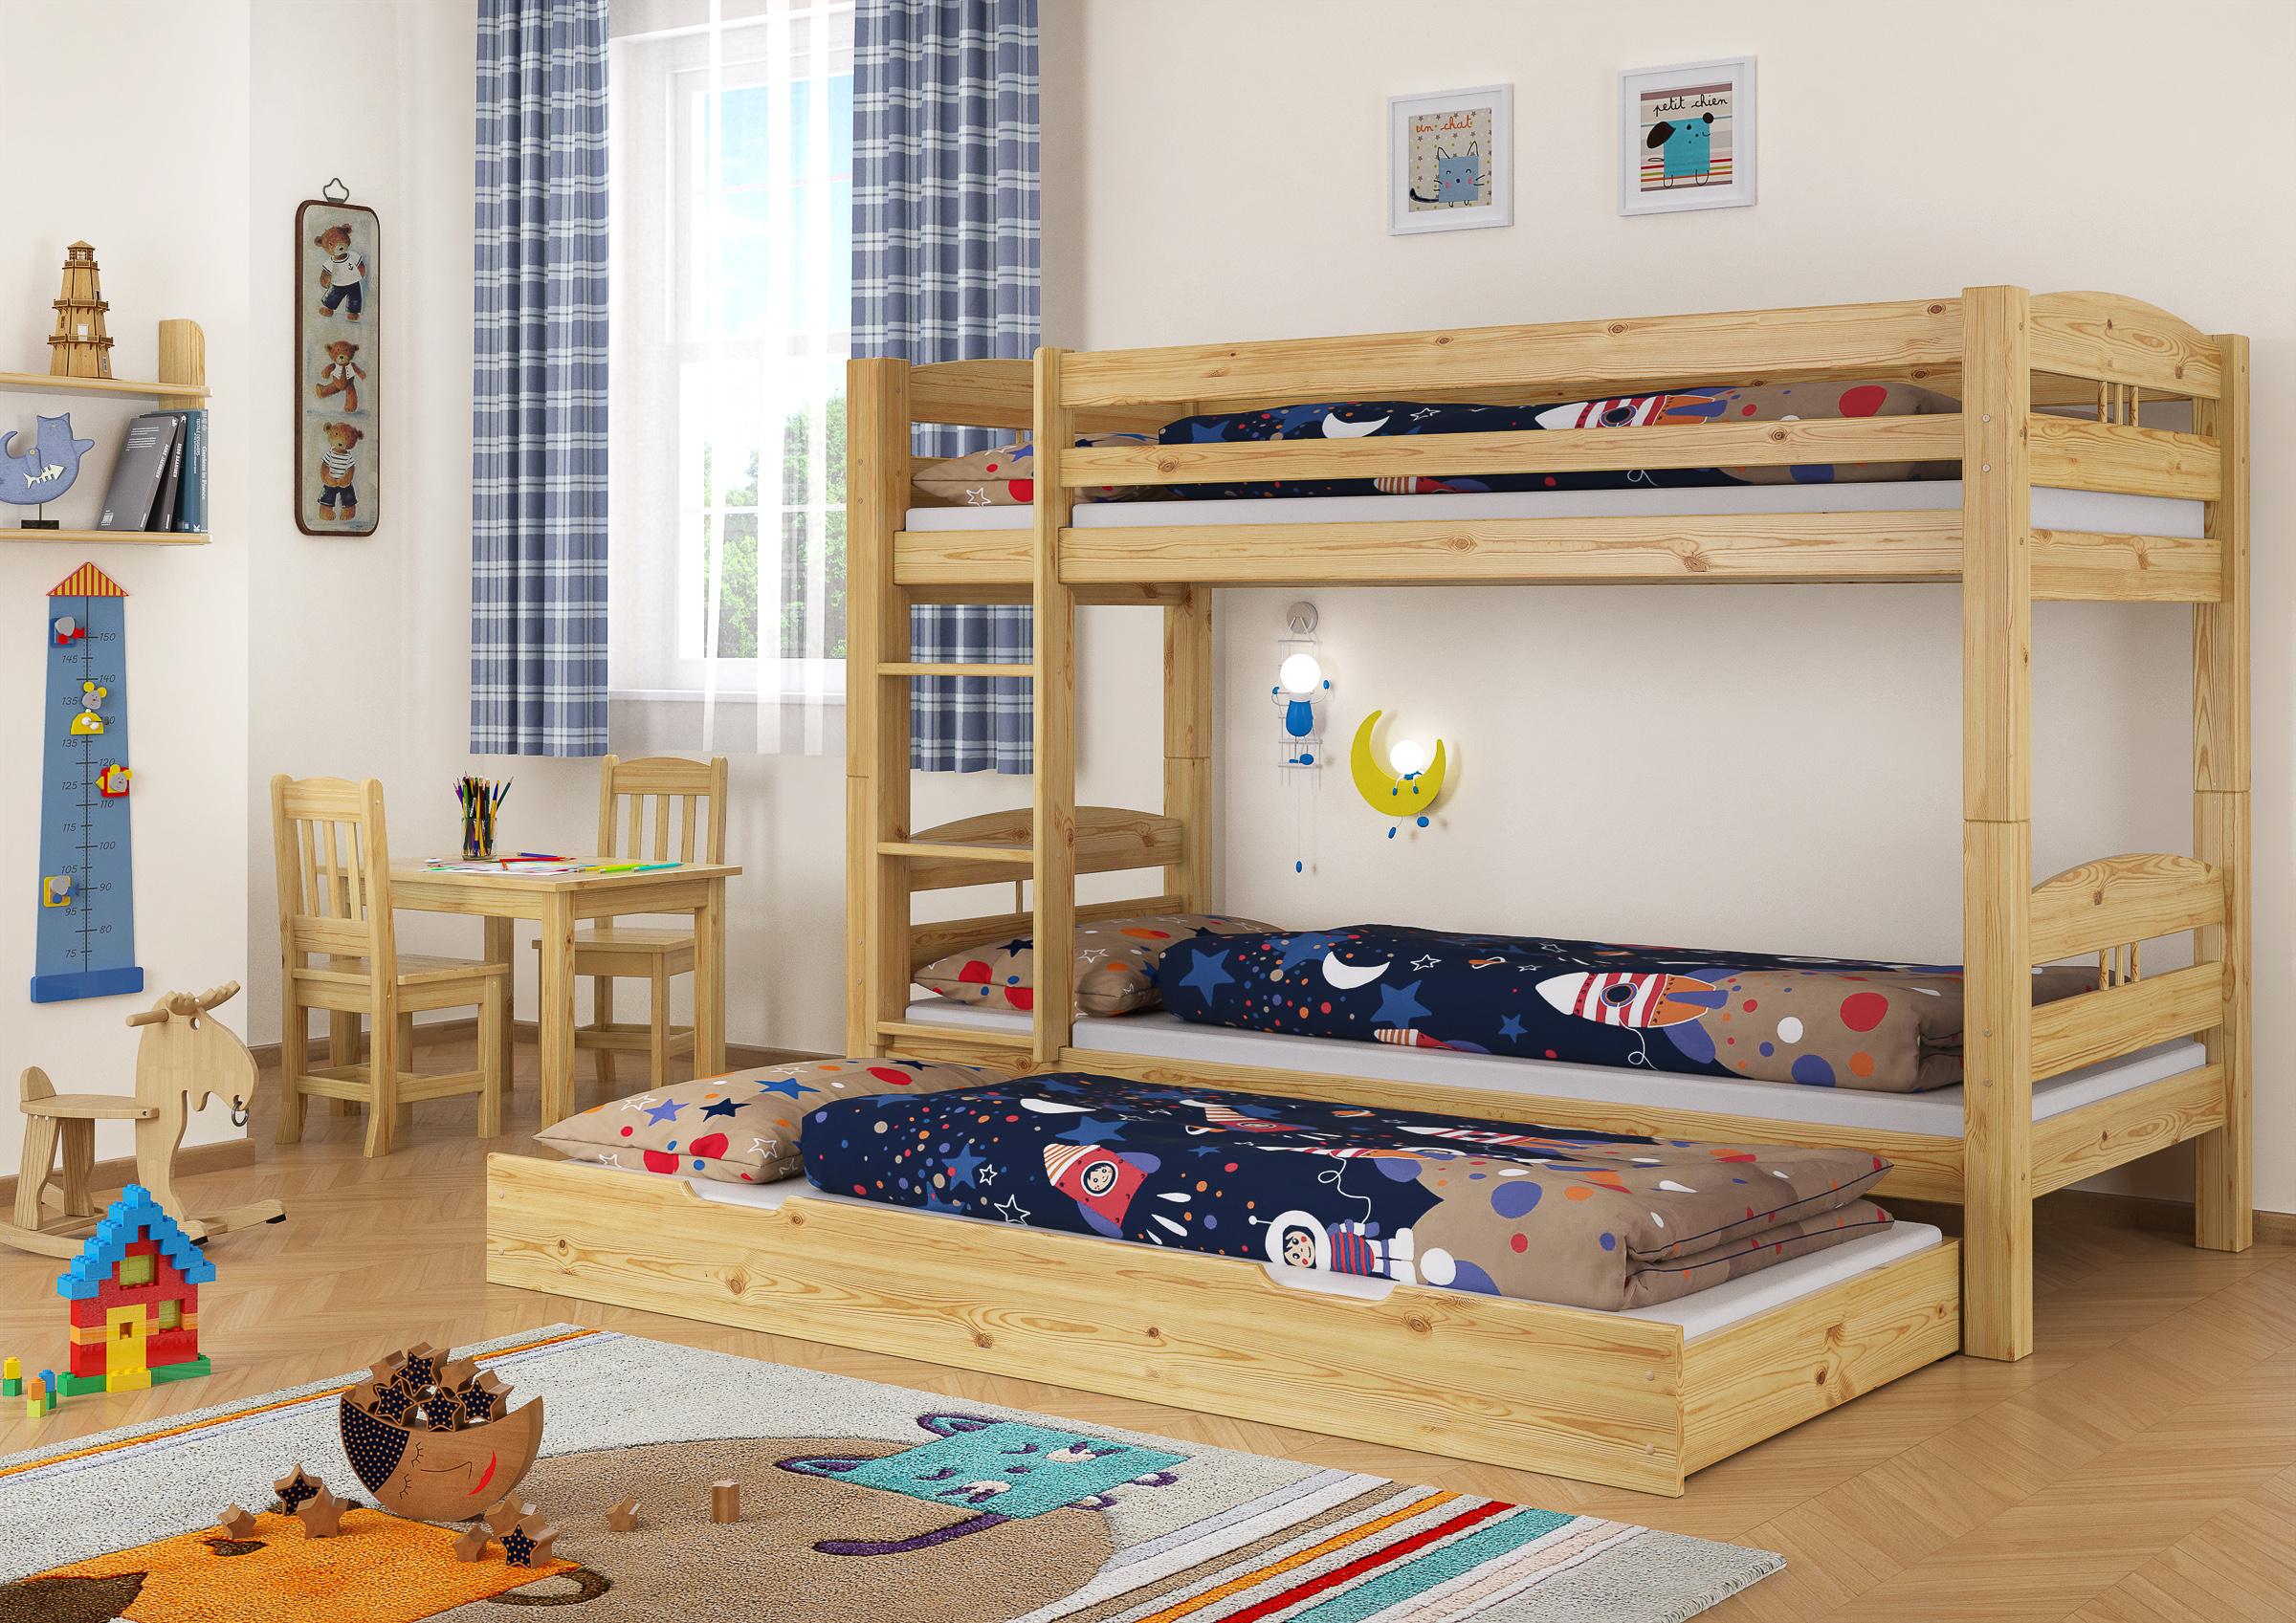 kinderzimmer etagenbett kiefer 90x200 bett stockbett rollroste g stebettkasten m s7m. Black Bedroom Furniture Sets. Home Design Ideas